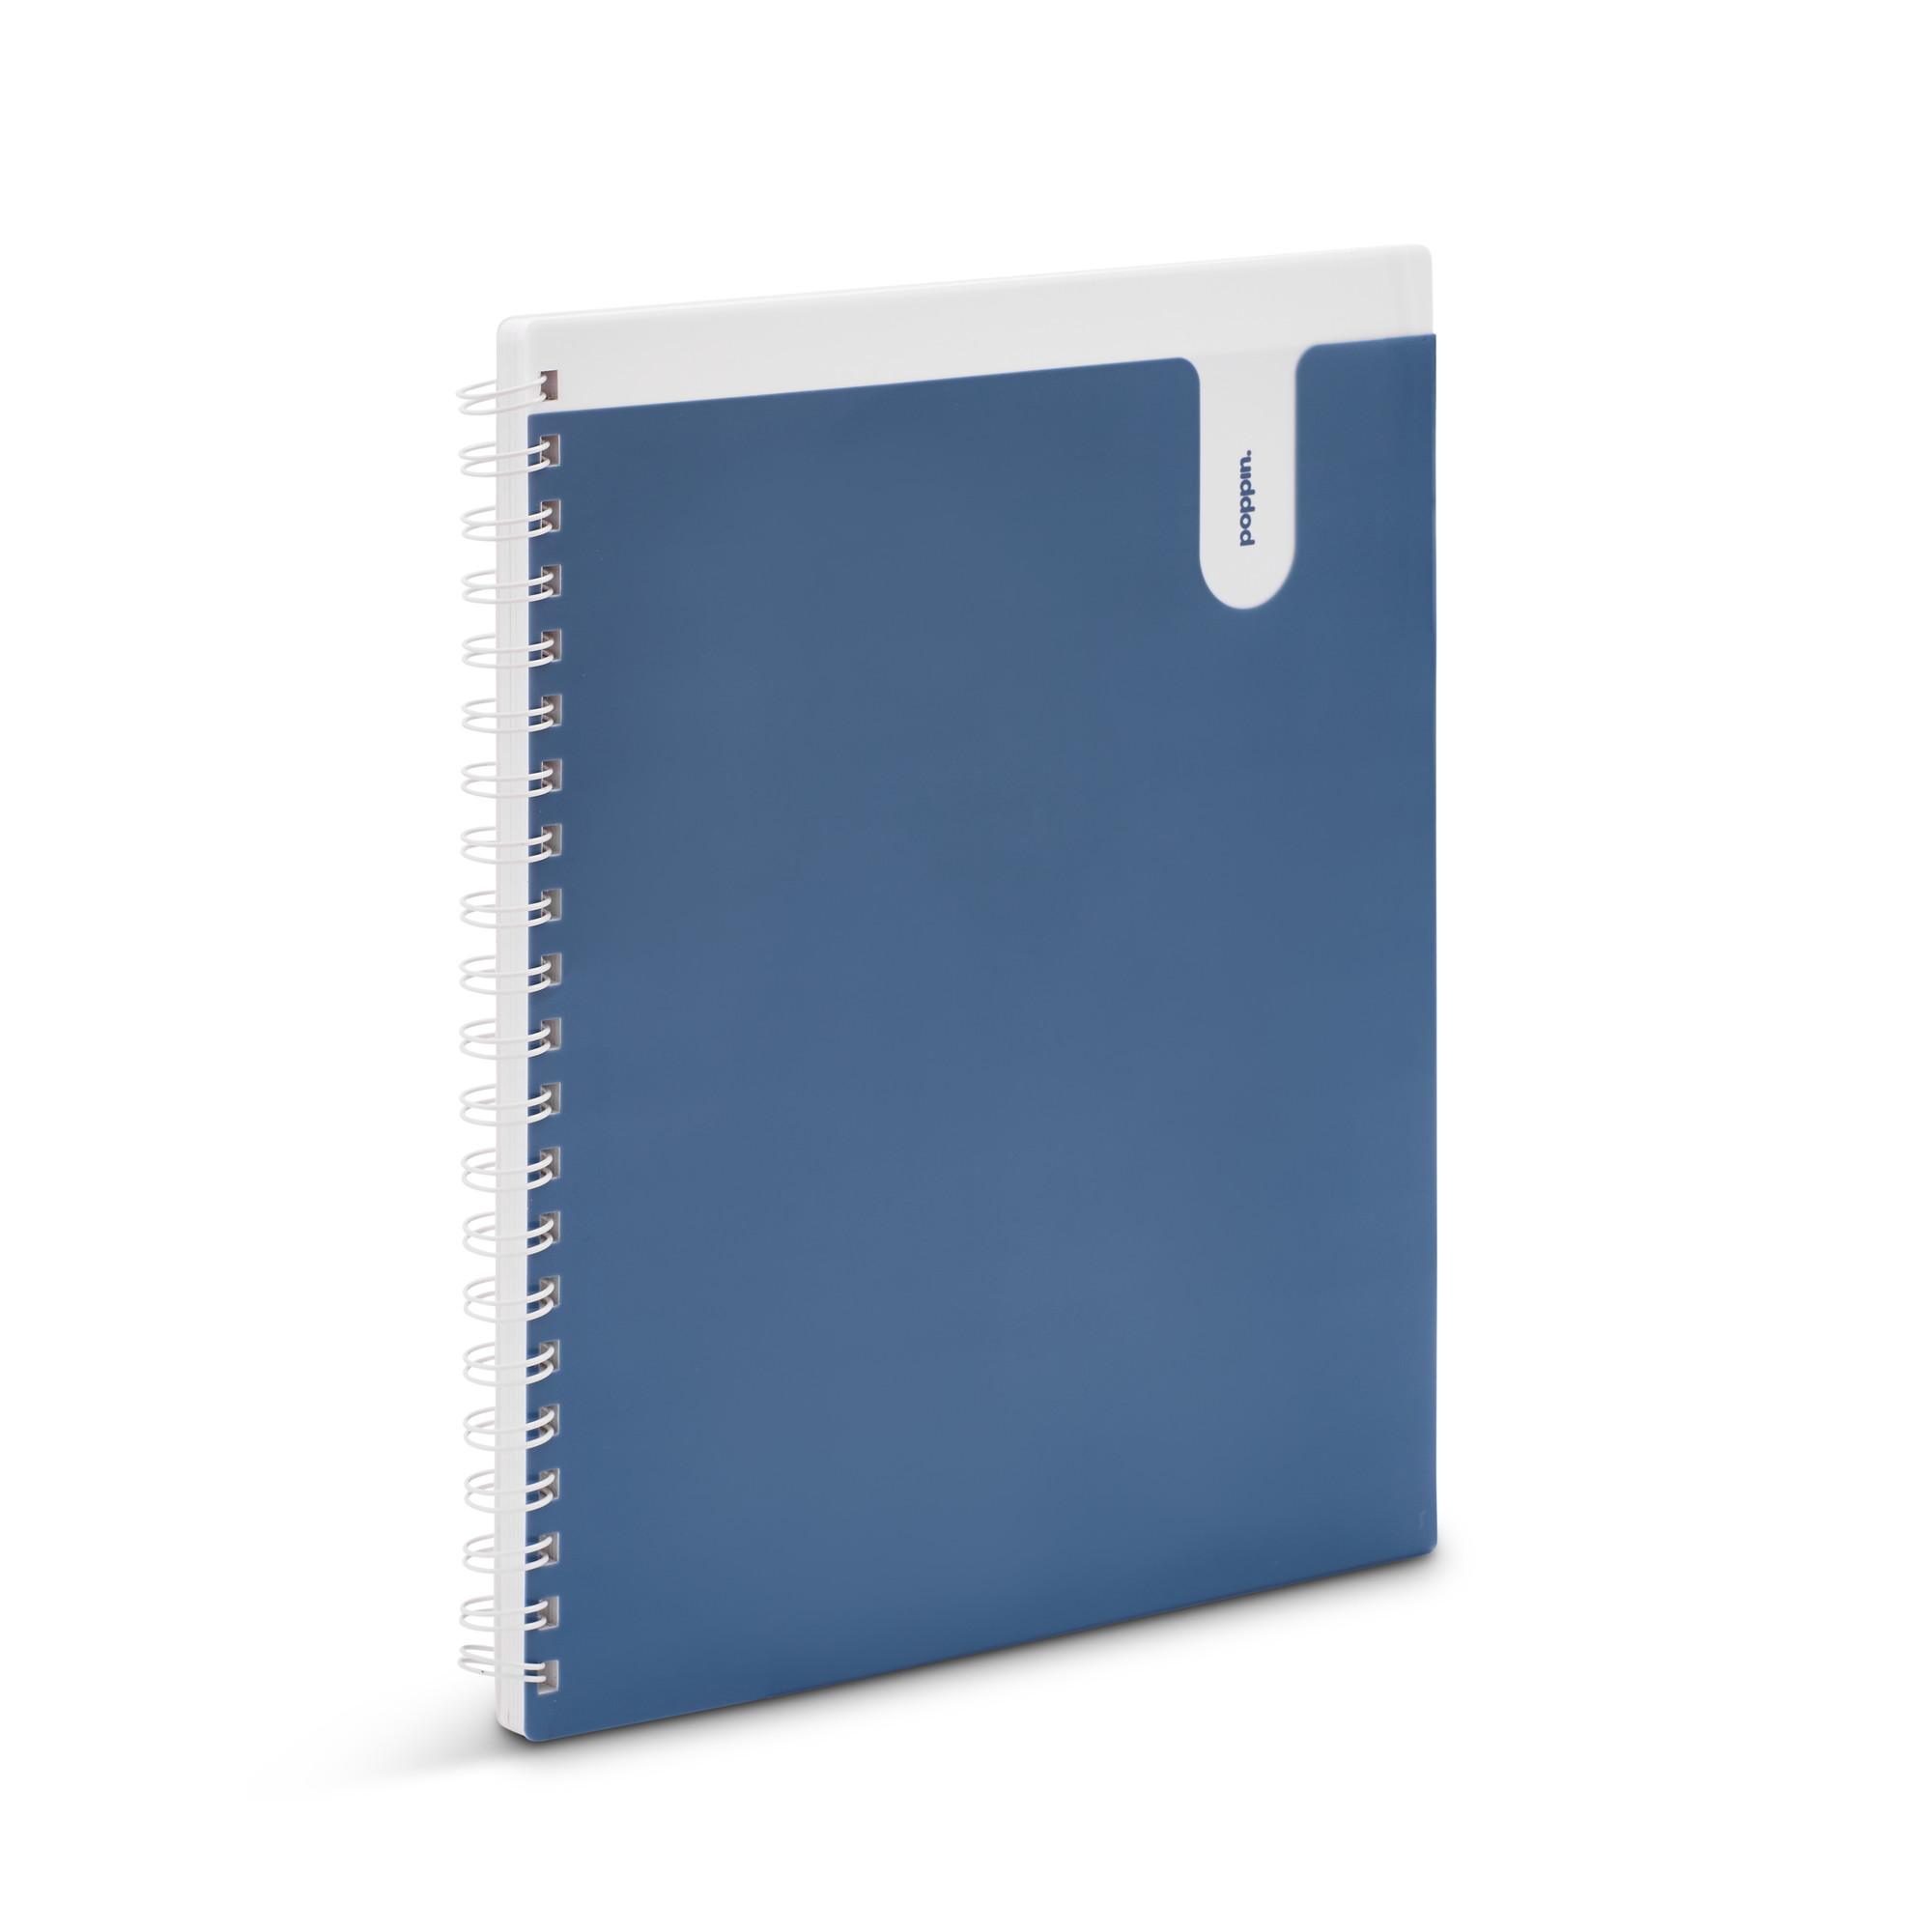 9097c69f3fcf Slate Blue 1-Subject Pocket Spiral Notebook   Notebooks   Poppin